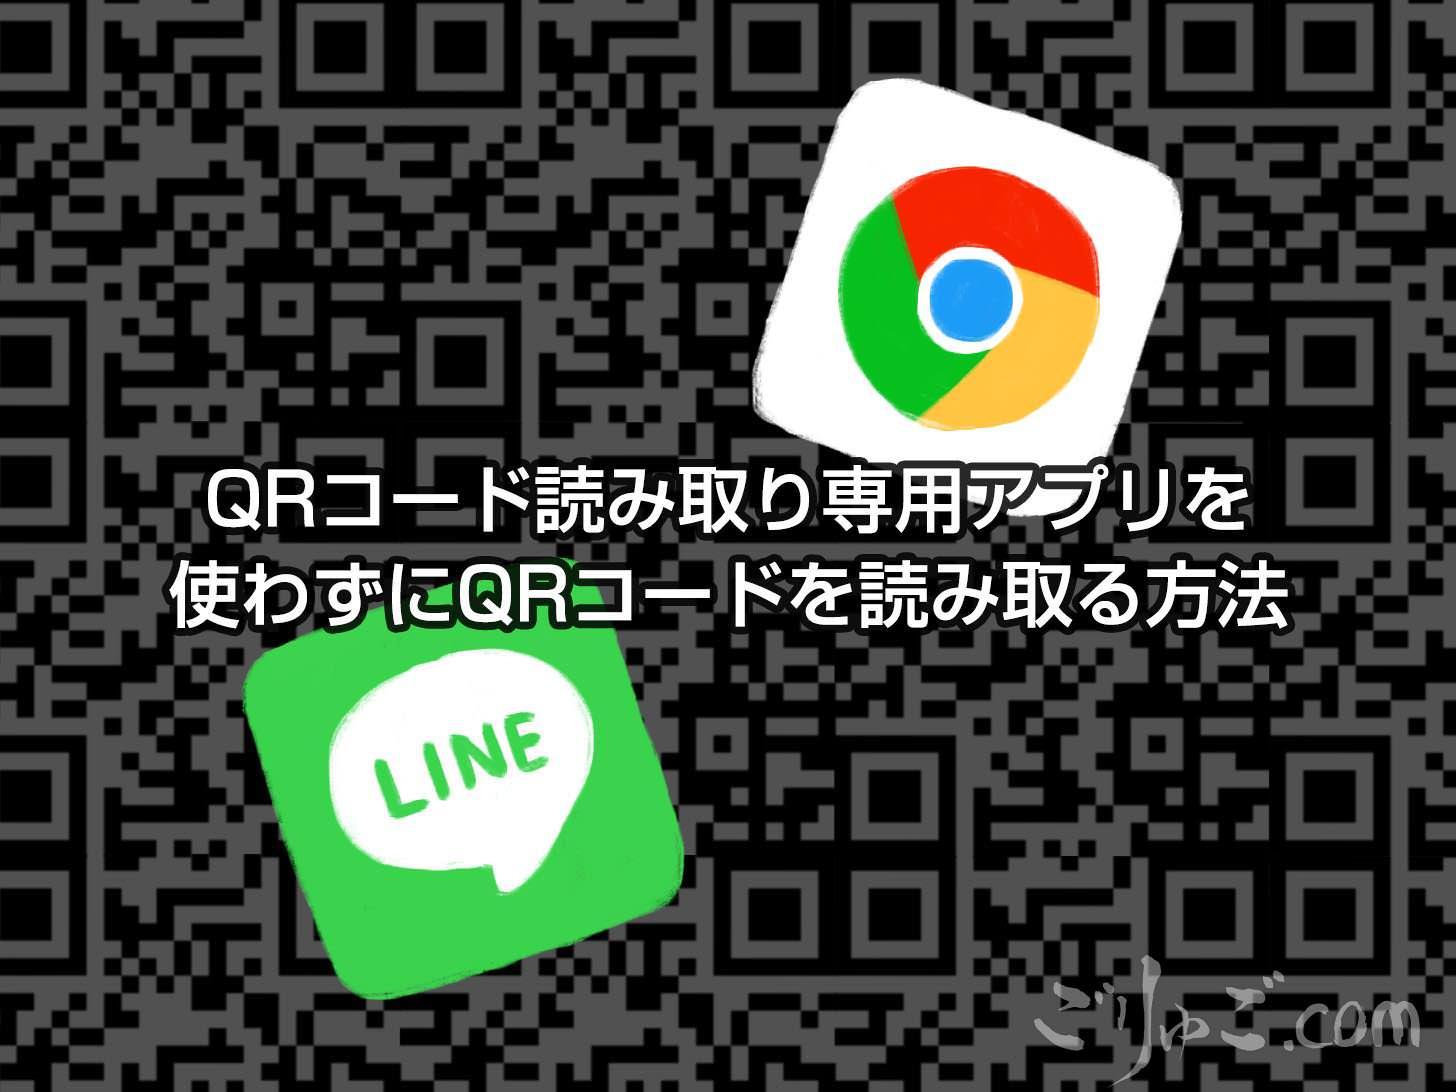 QRコード読み取り専用アプリを使わずにQRコードを読み取る方法